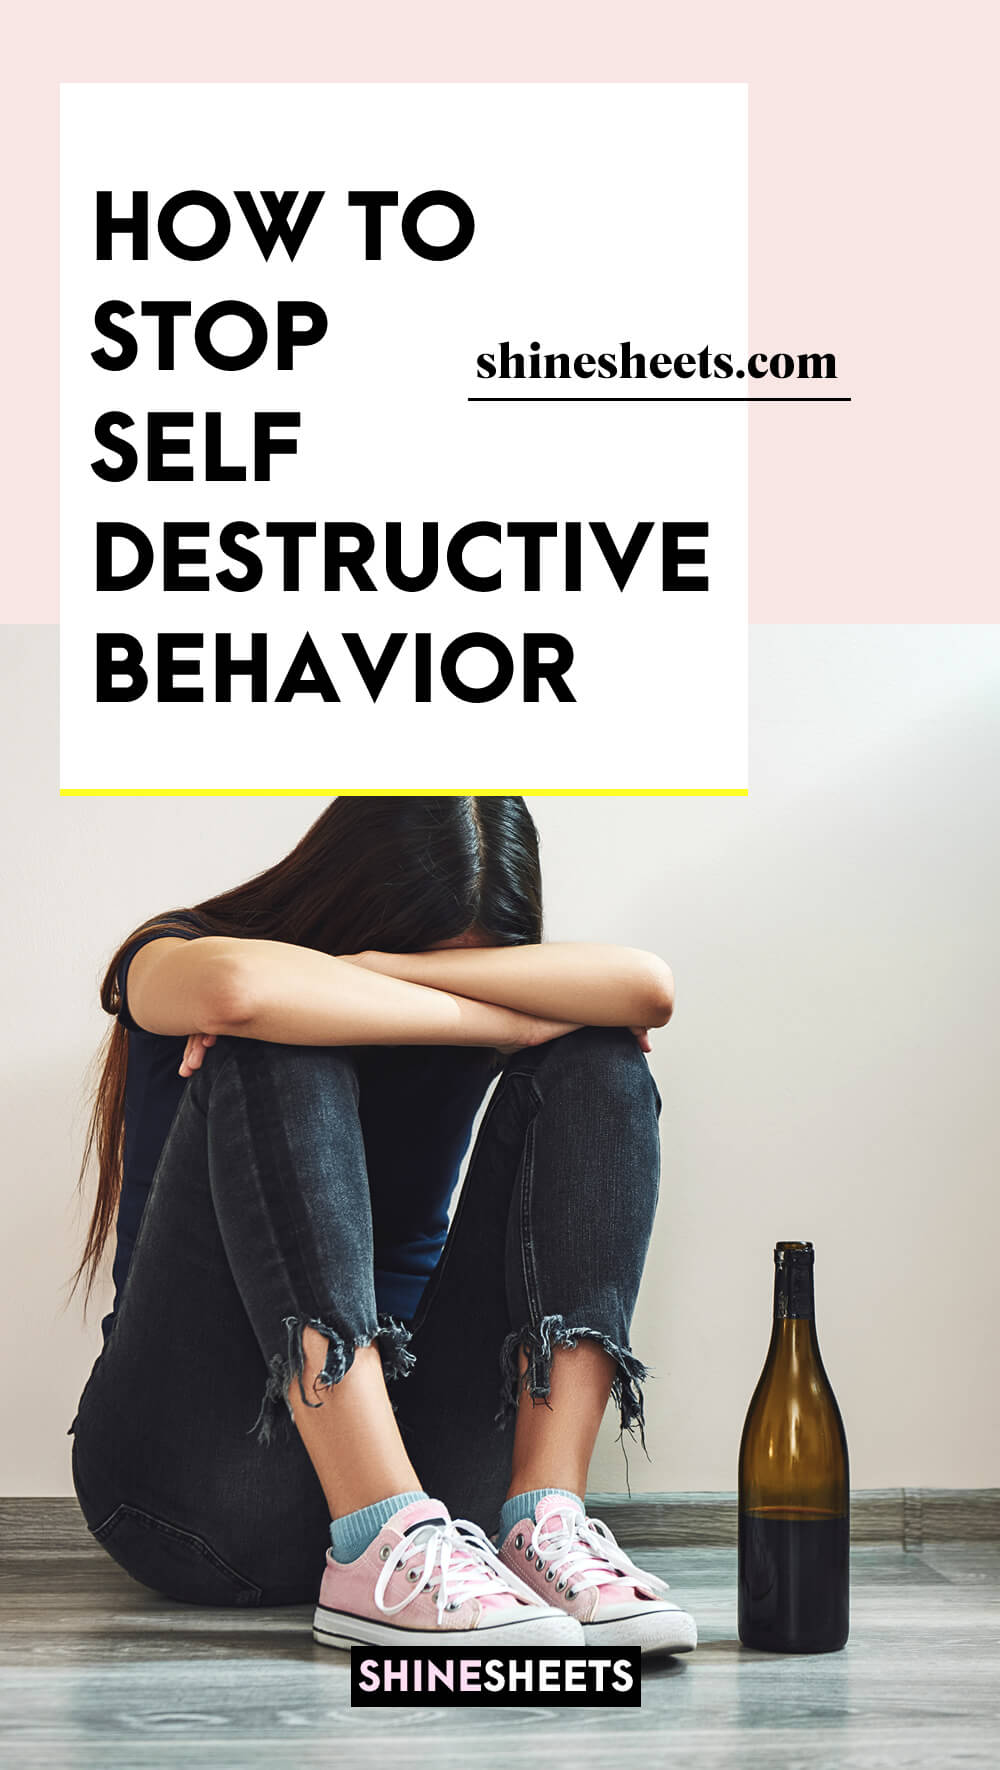 woman engaging in self-destructive behavior